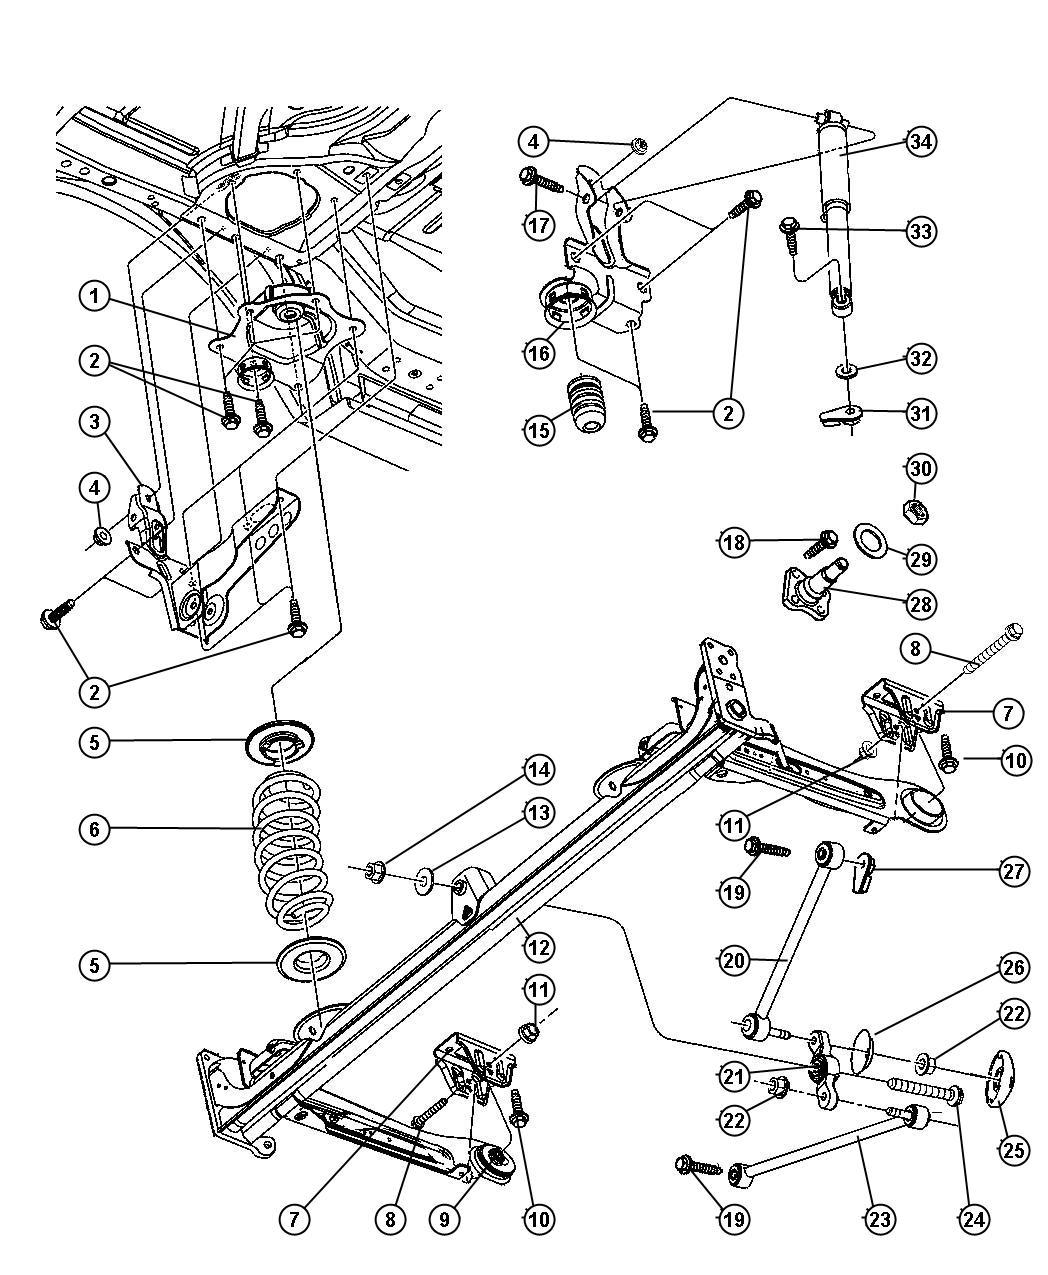 Dodge Durango Link Sway Eliminator Trackbar Bell Crank